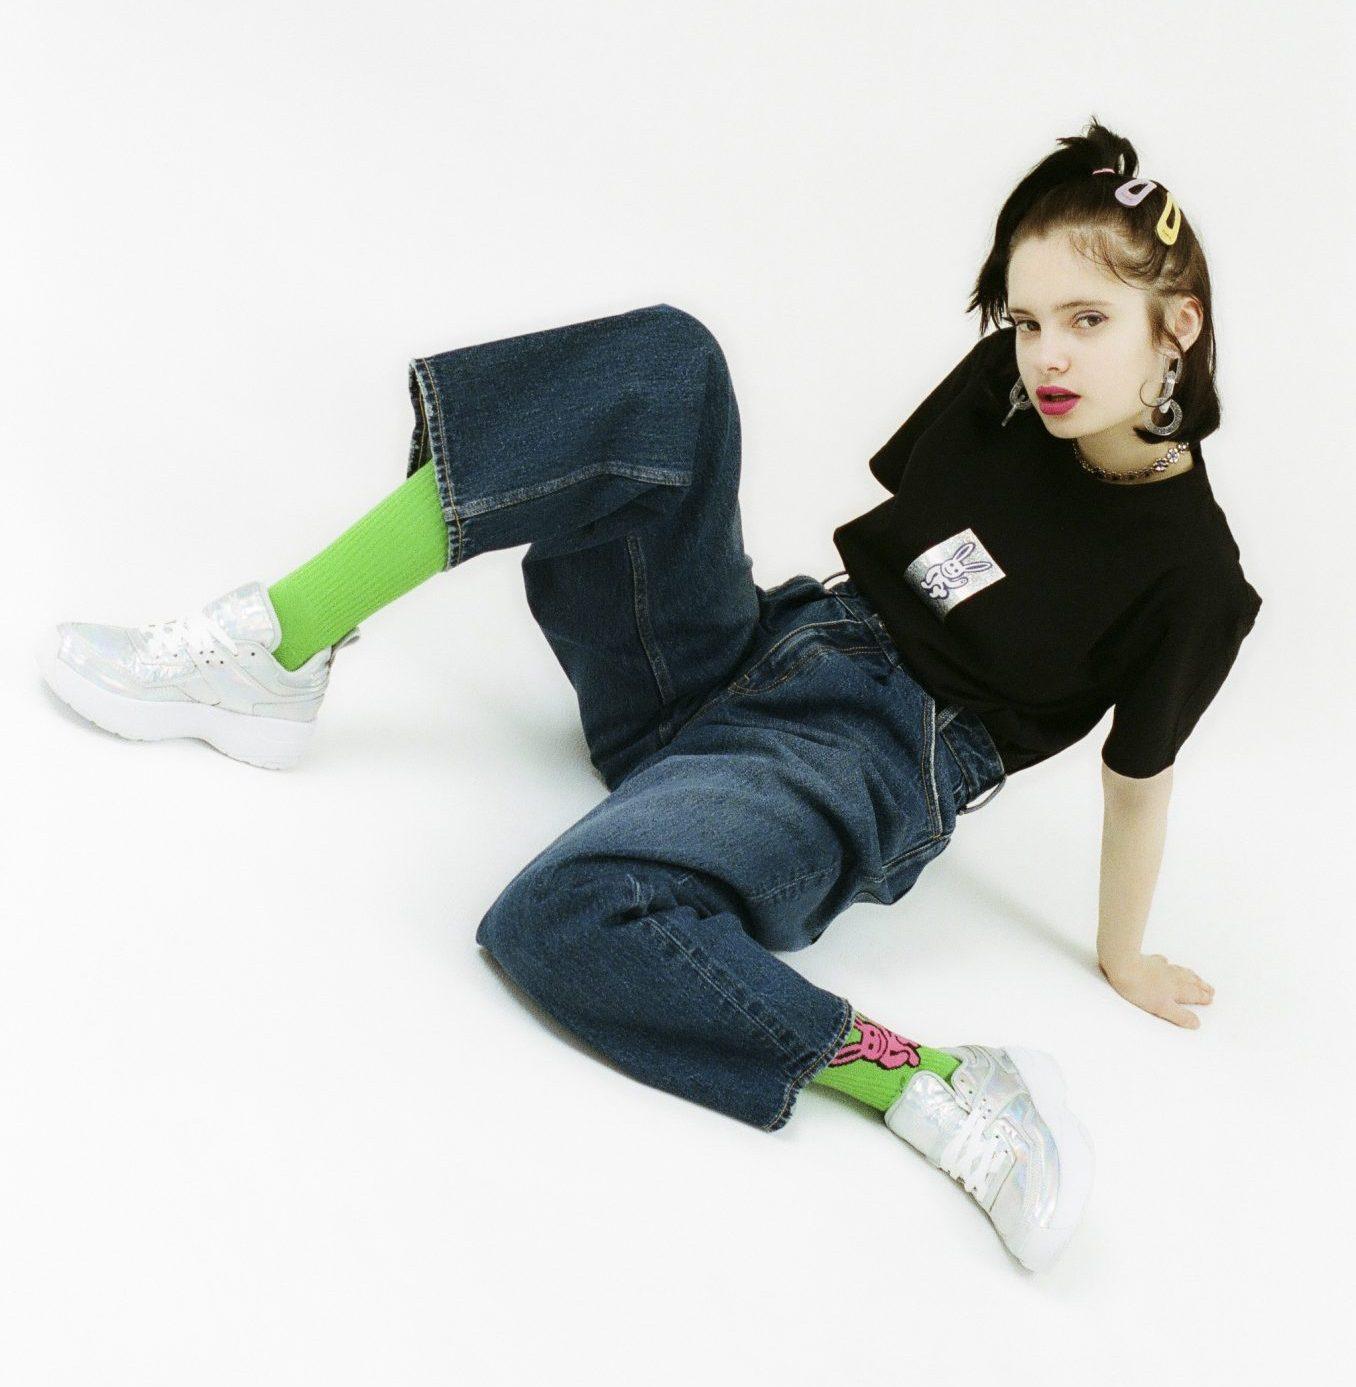 X-girl × DCシューズ 初のコラボ!!! #dcshoes #x-girl